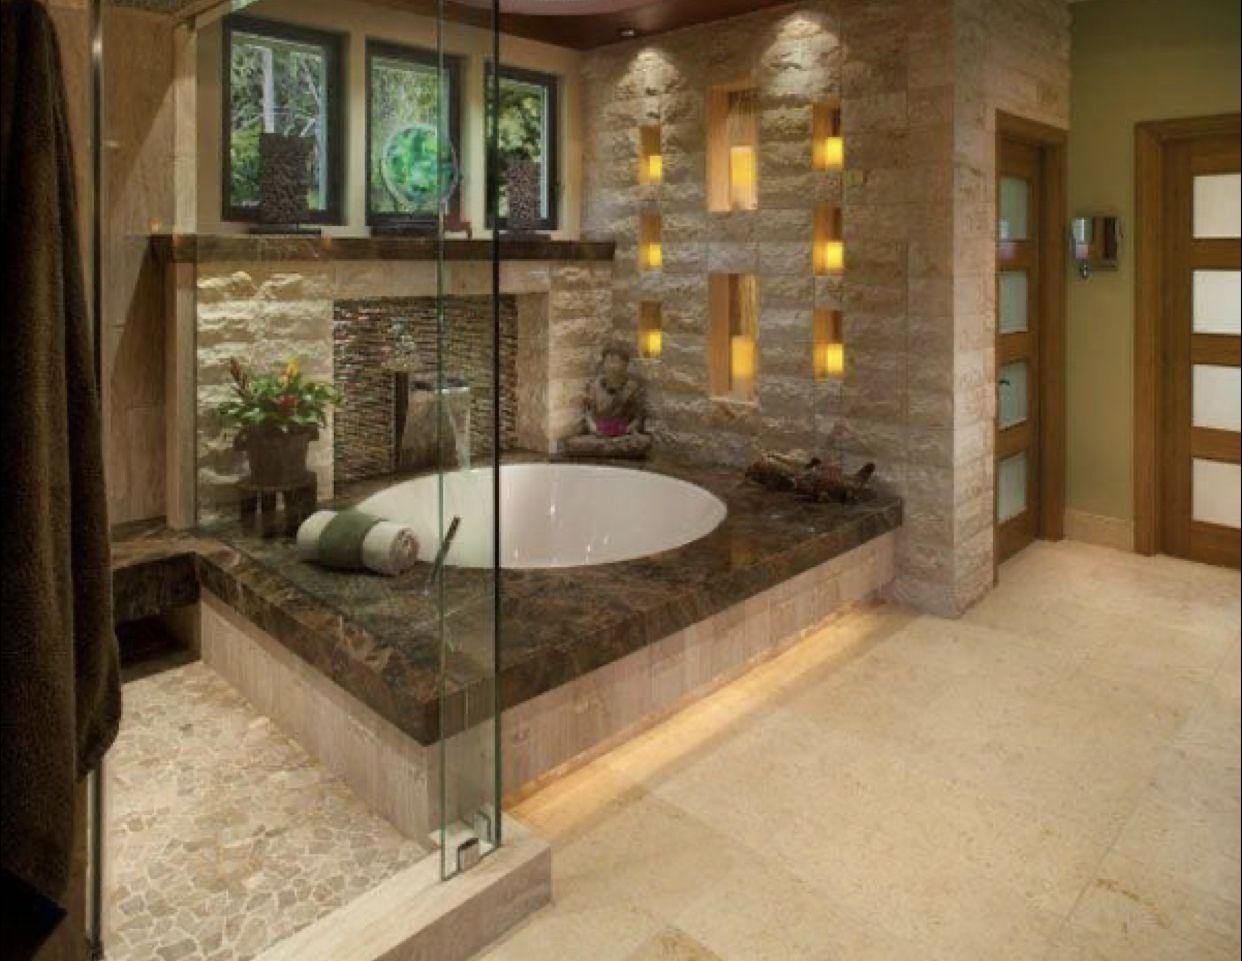 Crazy Bathroom Goals In 2020 Modern Bathroom Design